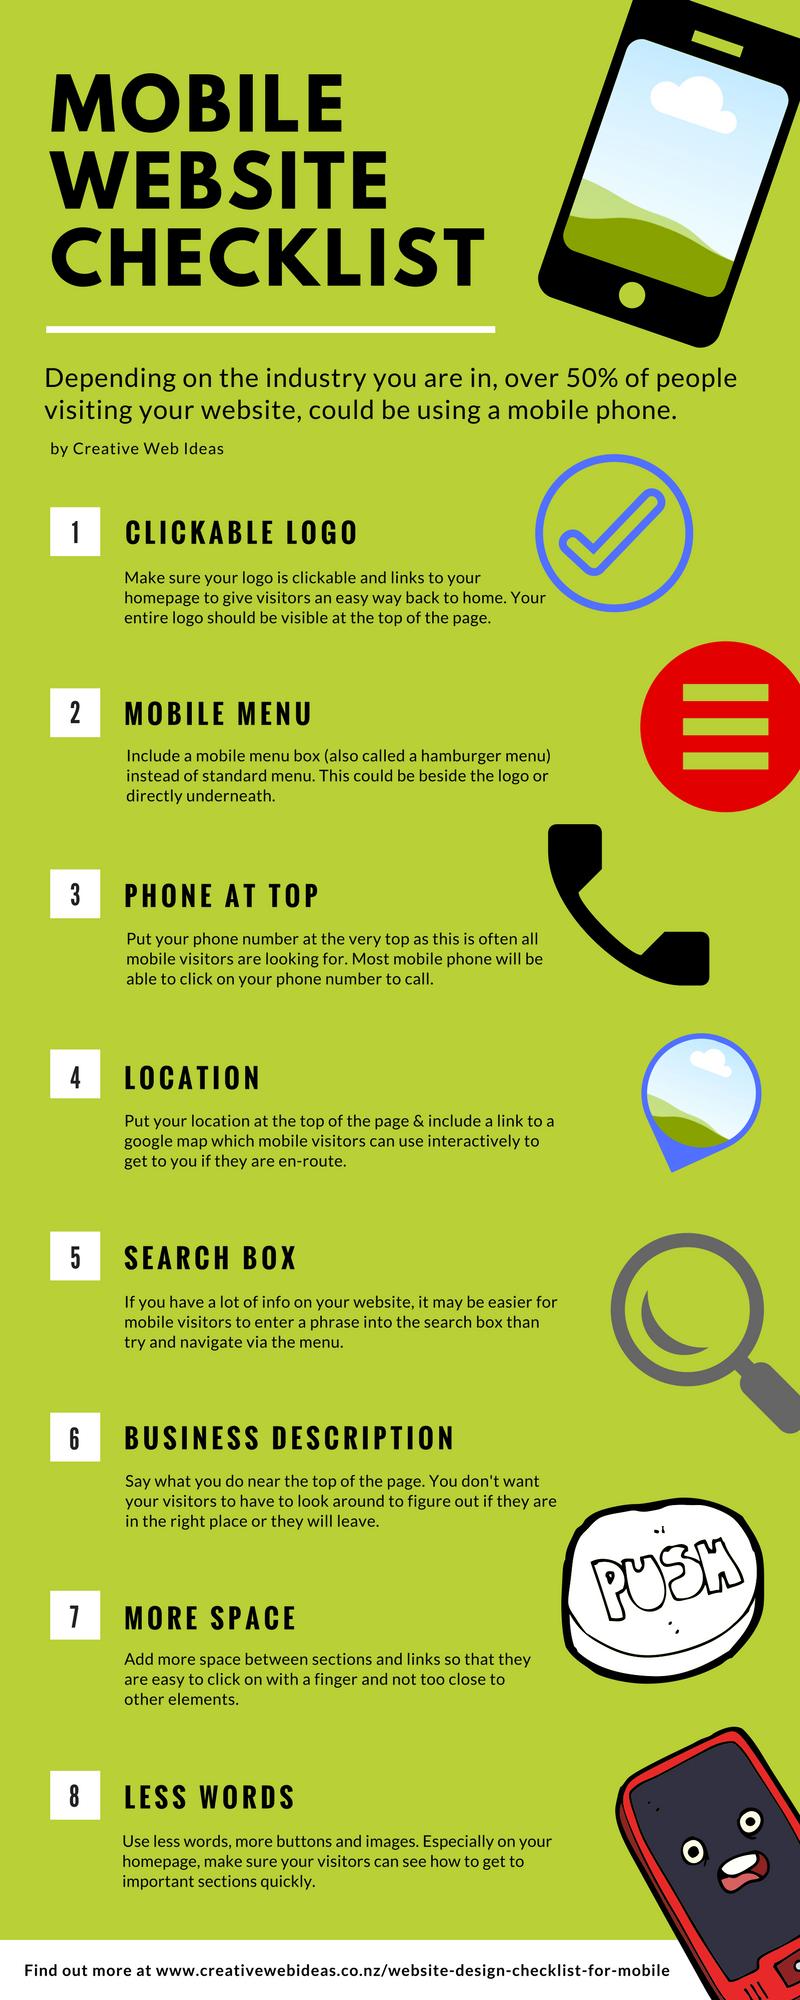 mobile website design checklist